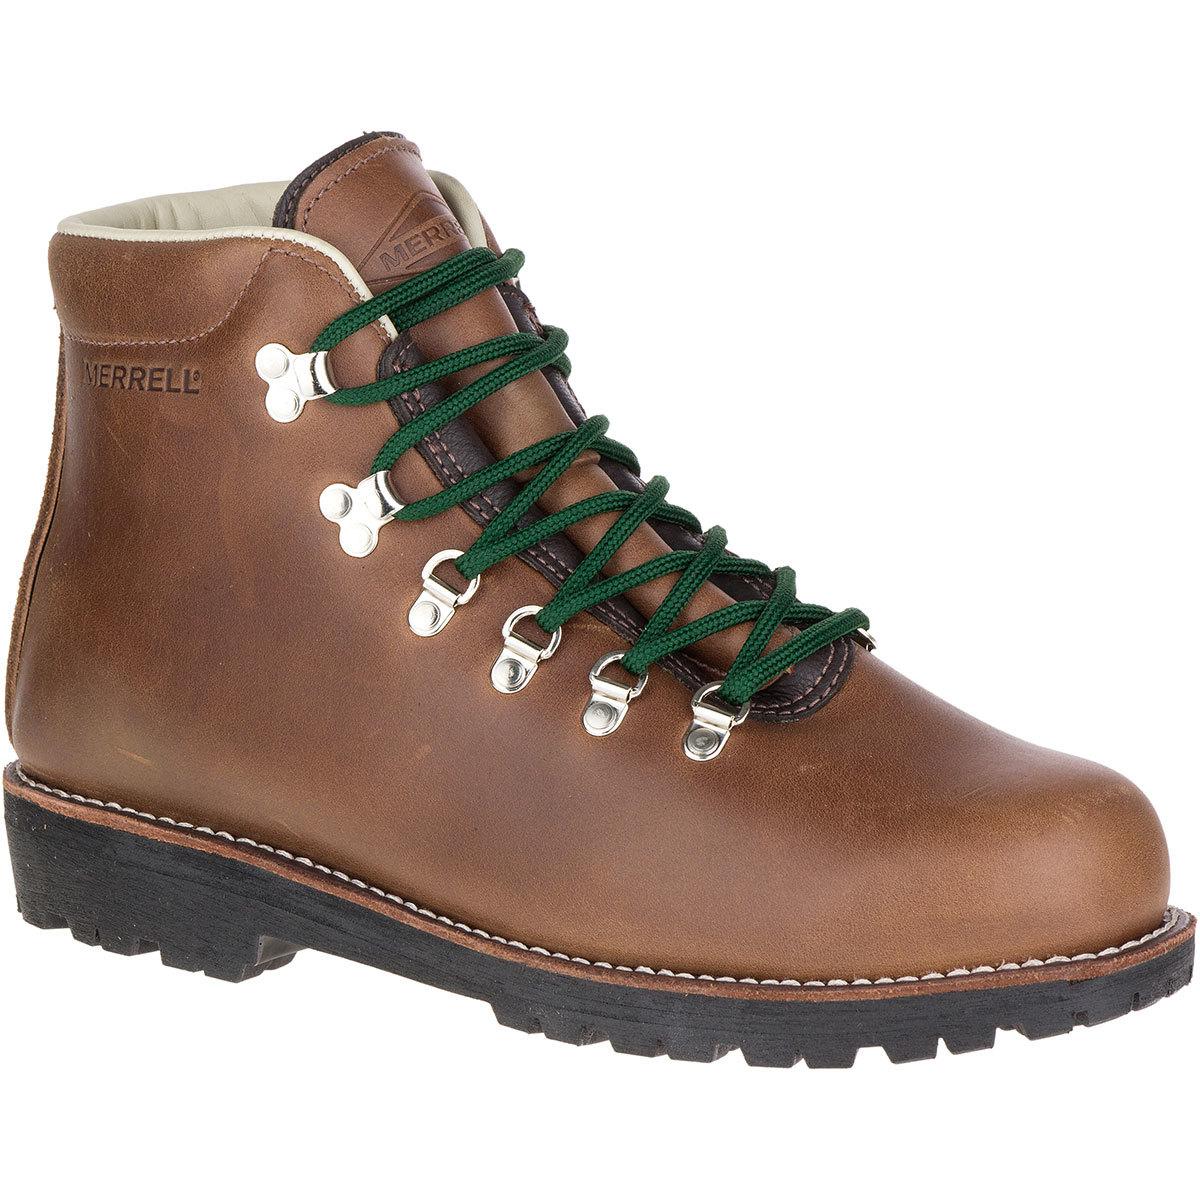 Merrell Men's Wilderness Hiking Boots - Brown, 11.5